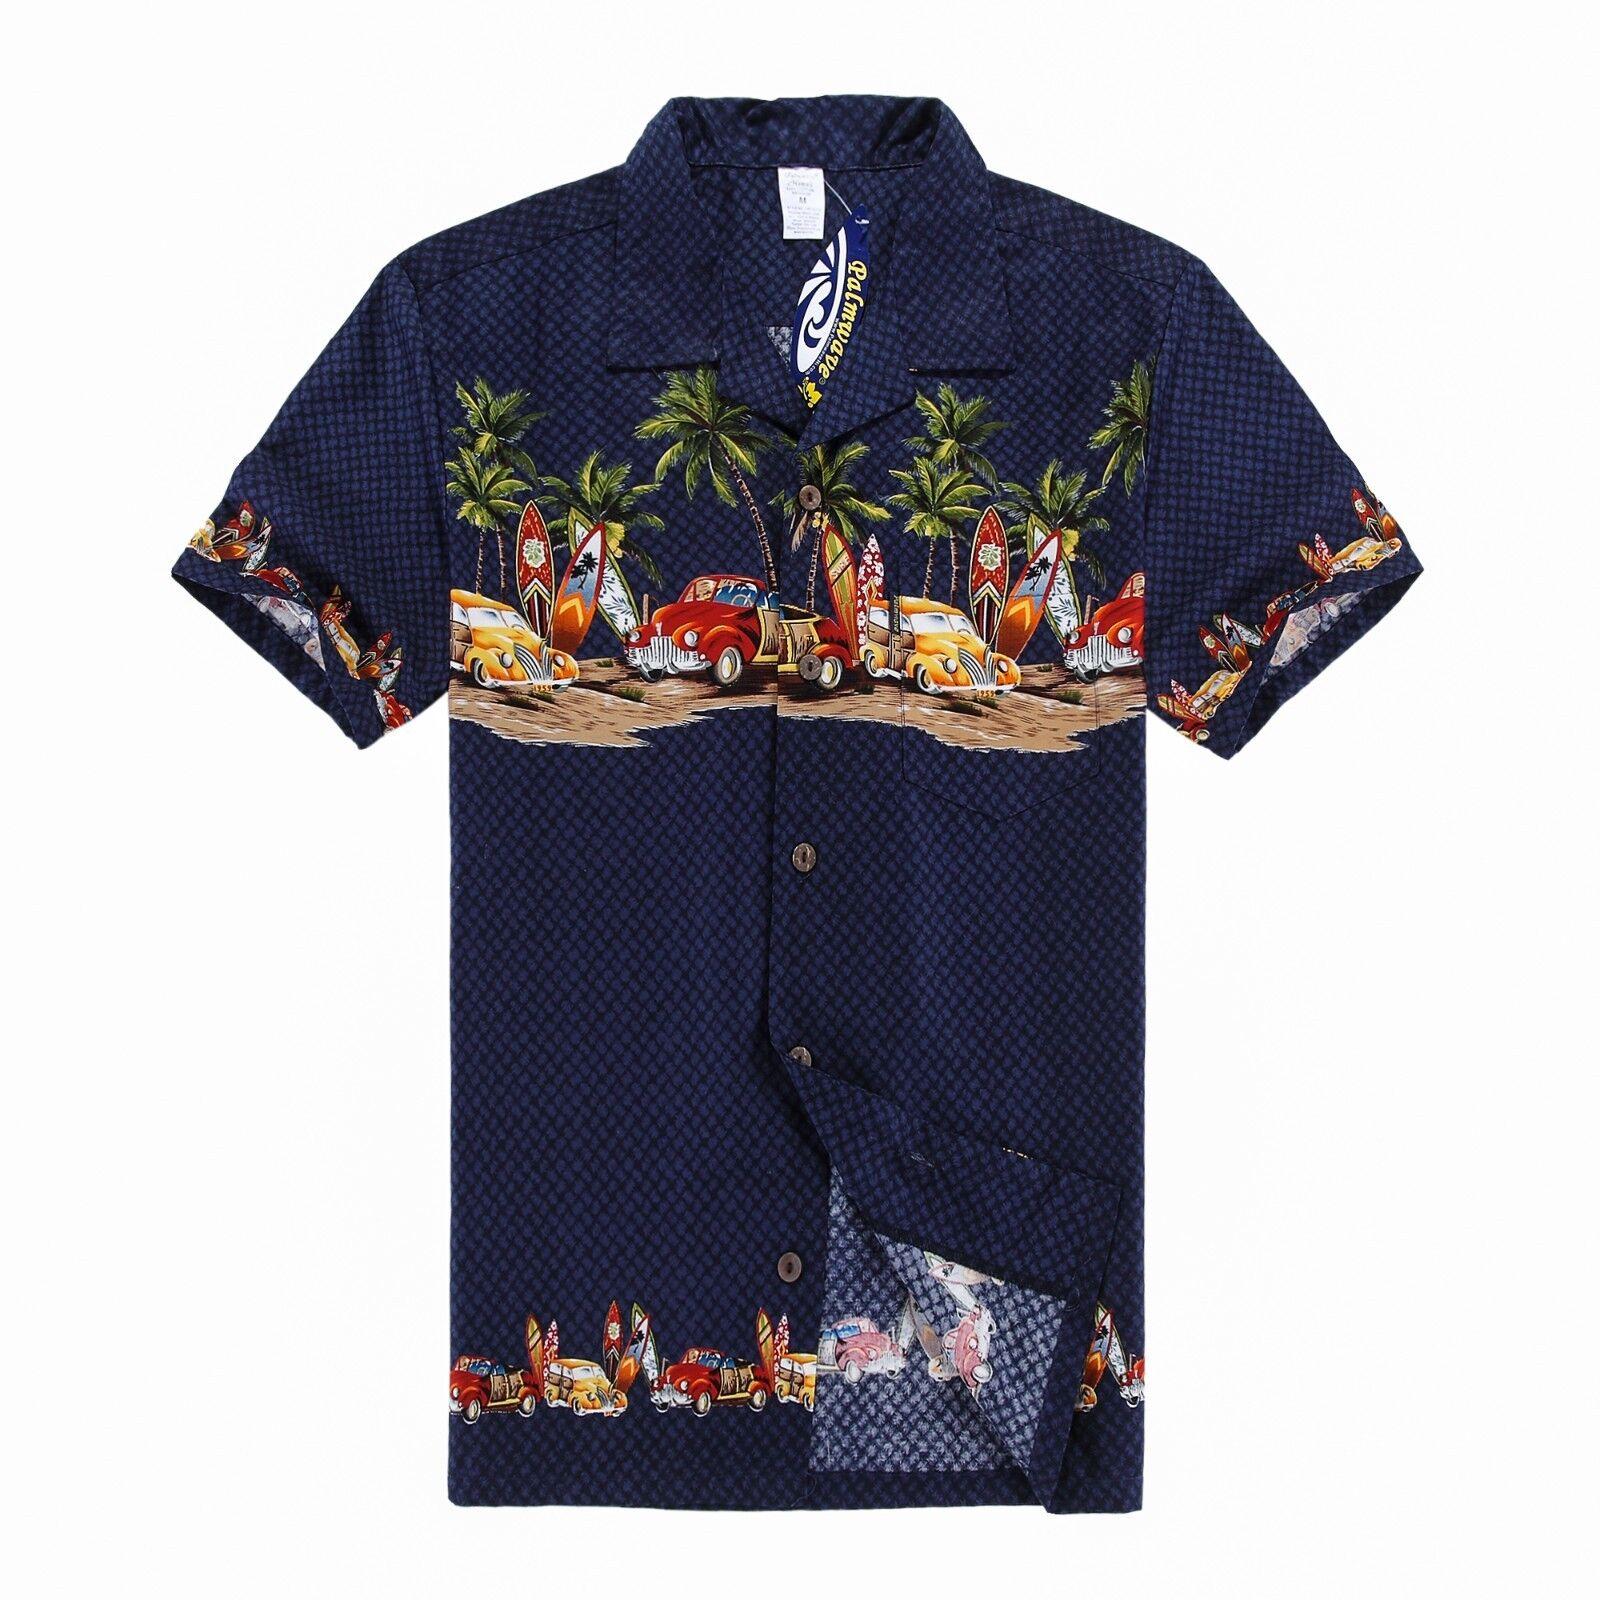 5ffb7ffd Palm Wave Mens Hawaiian Shirt Aloha Shirt XL Navy Vintage Cars | eBay